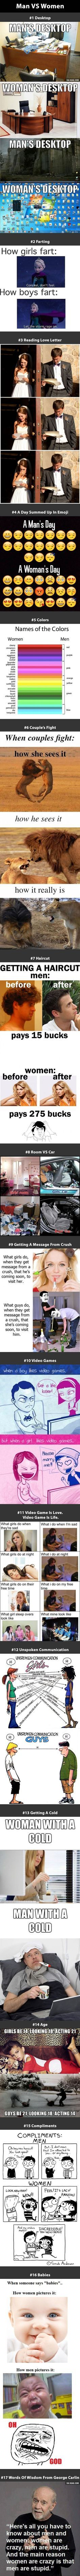 17 Differences Between Men And Women - 9GAG hahahhahahahhhahahahaha